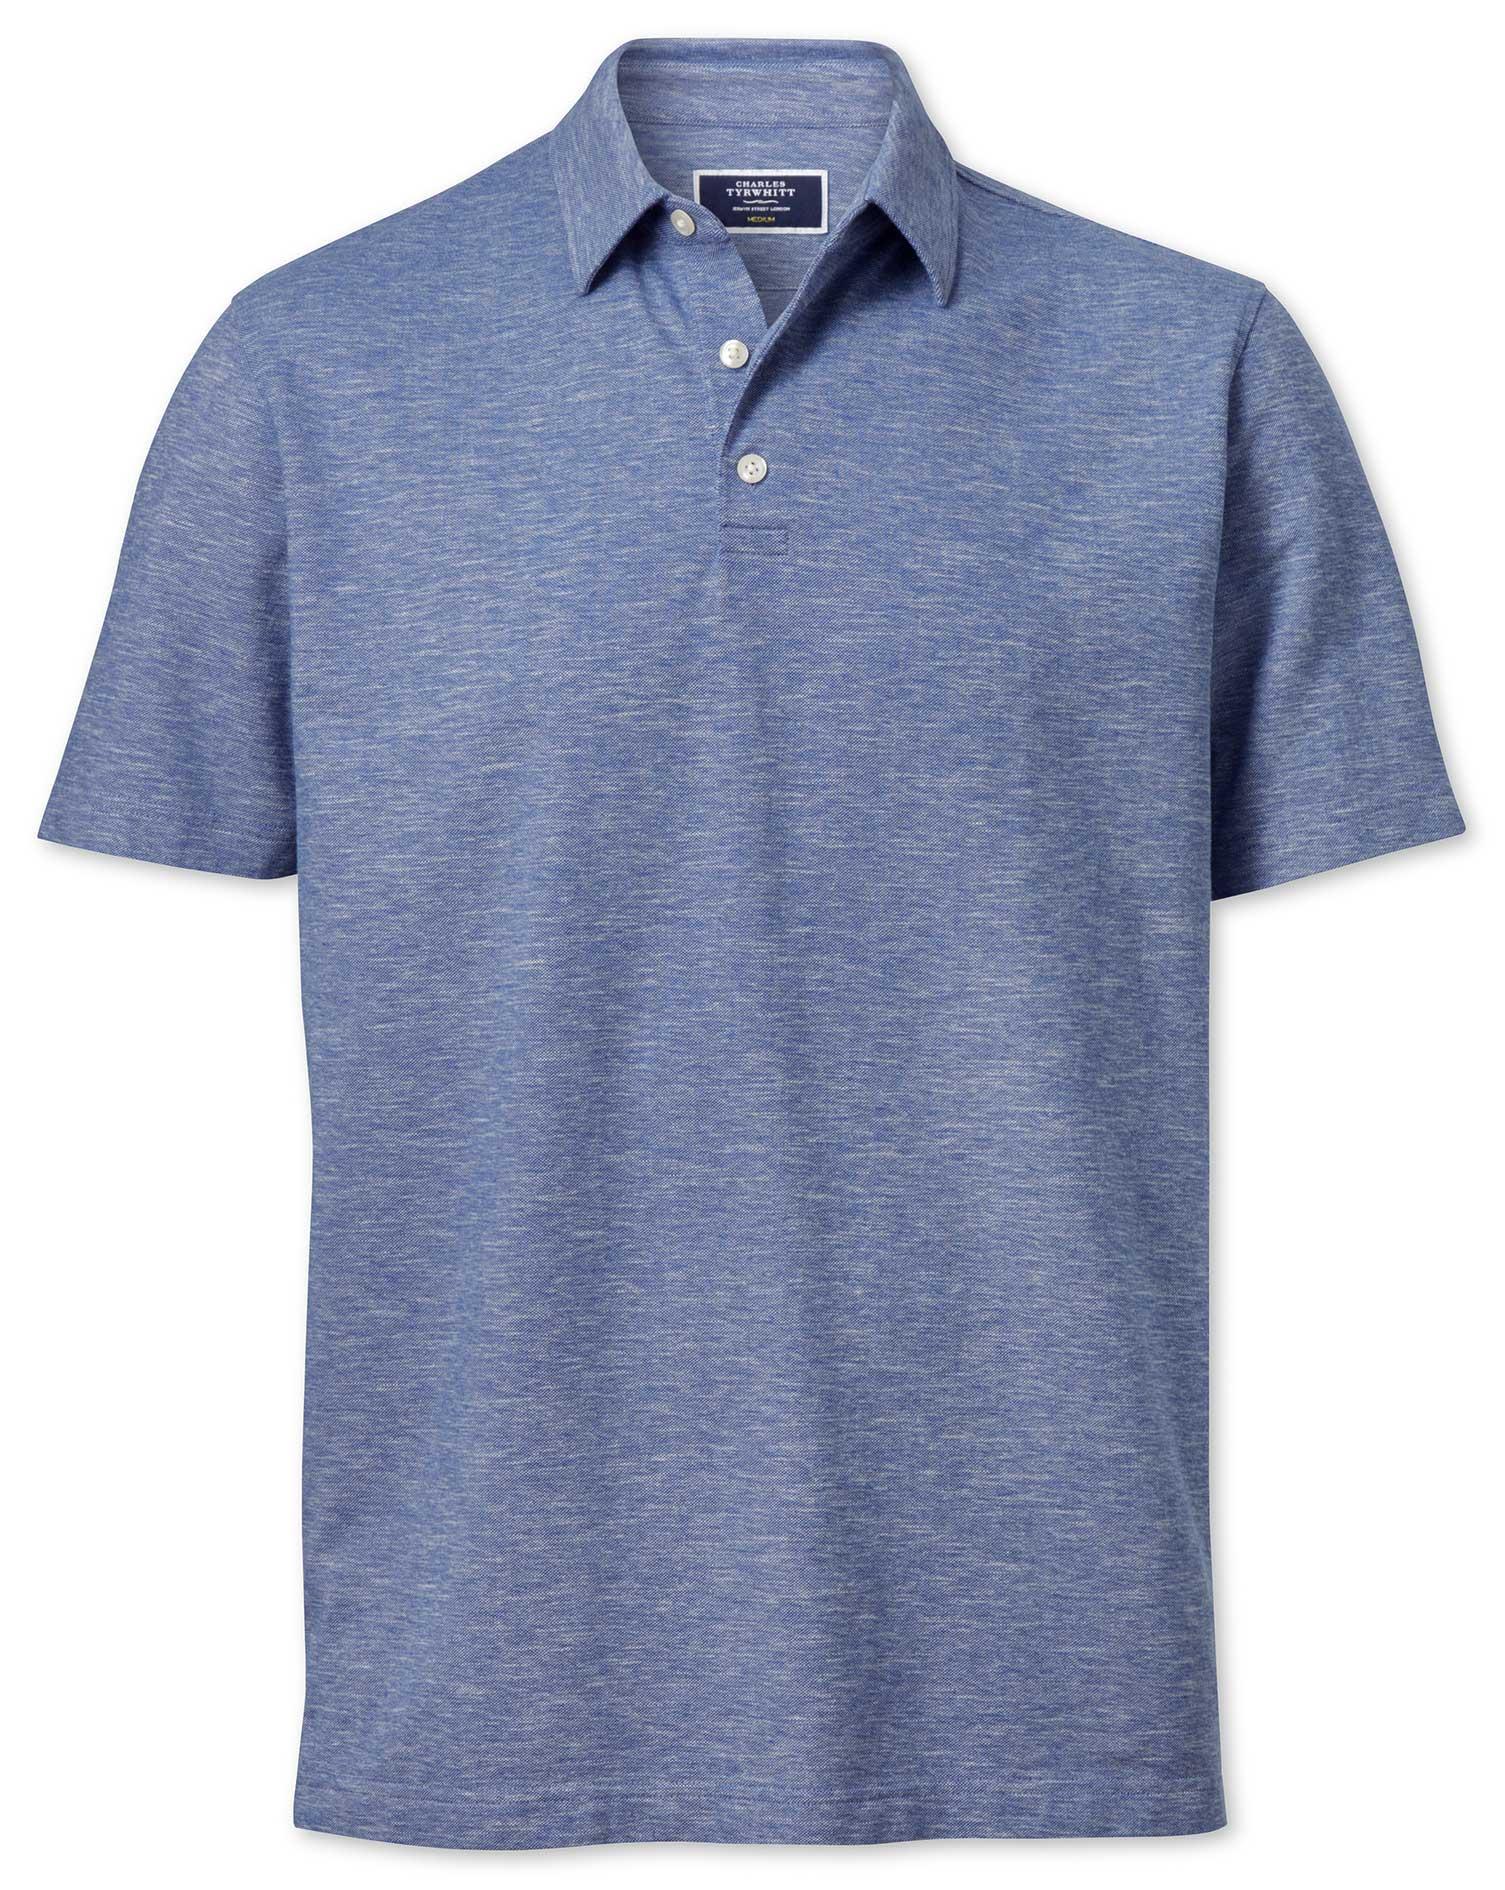 Navy Cotton Linen Polo Size XL by Charles Tyrwhitt